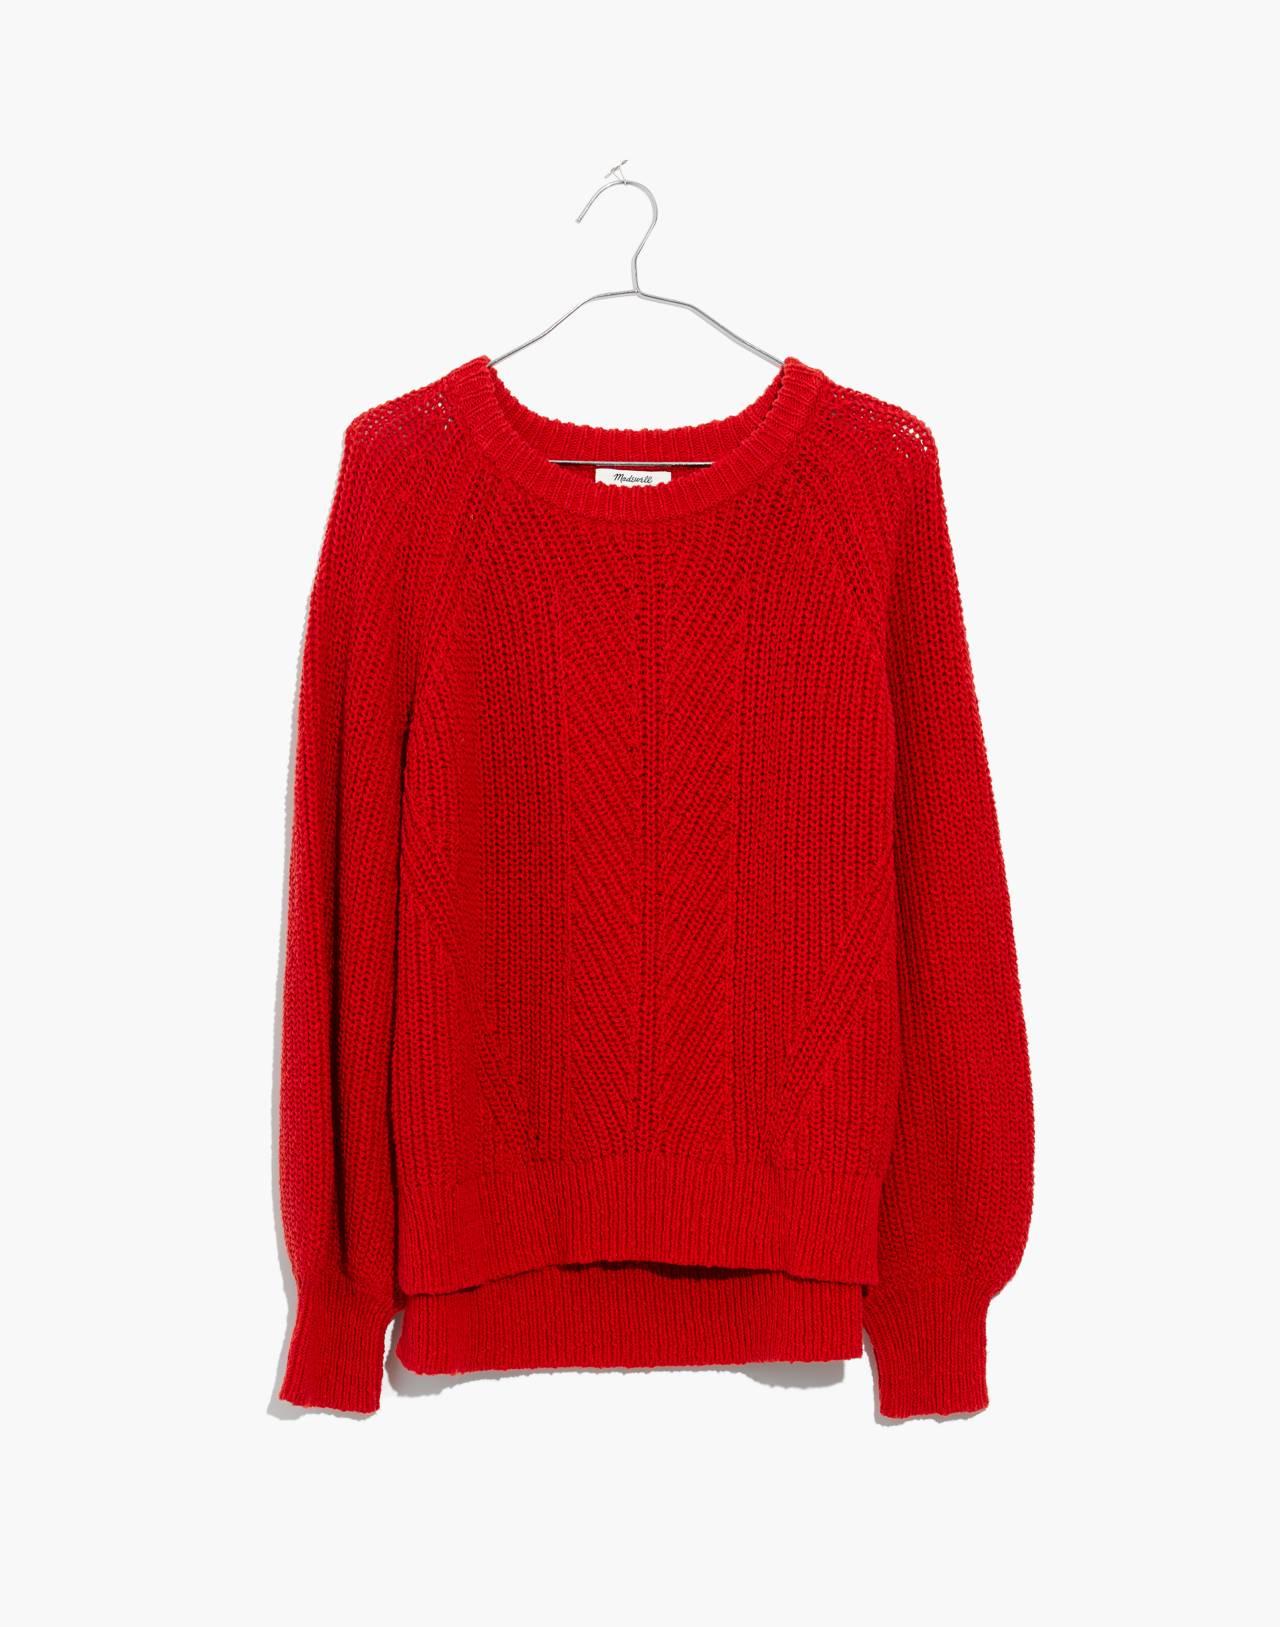 Balloon-Sleeve Pullover Sweater in bright scarlett image 1